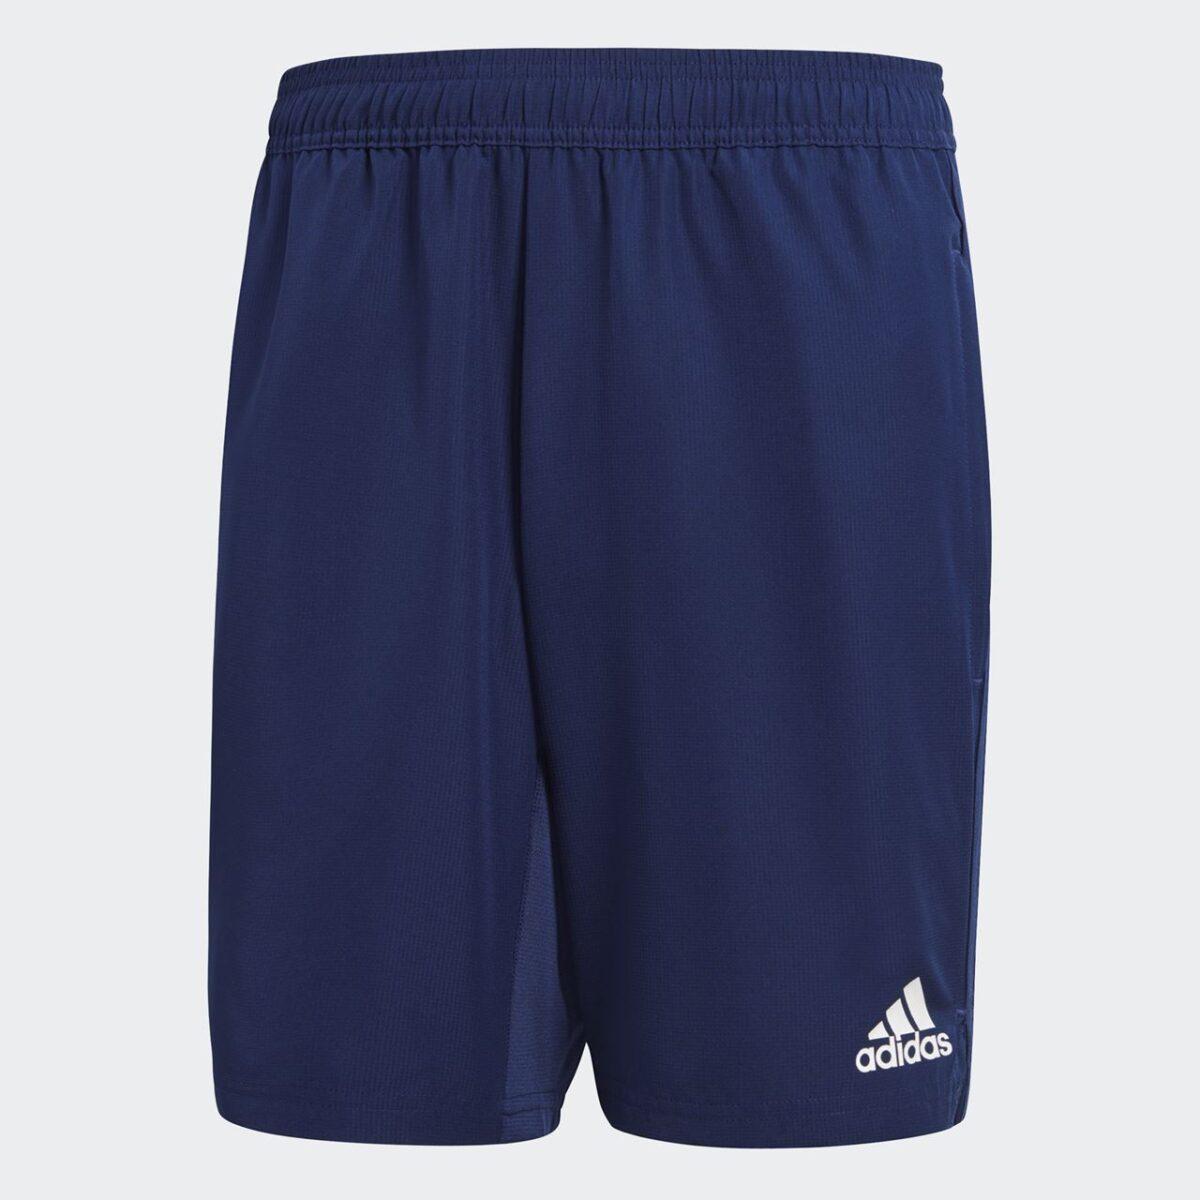 Adidas Condivo 18 Woven Short Adult